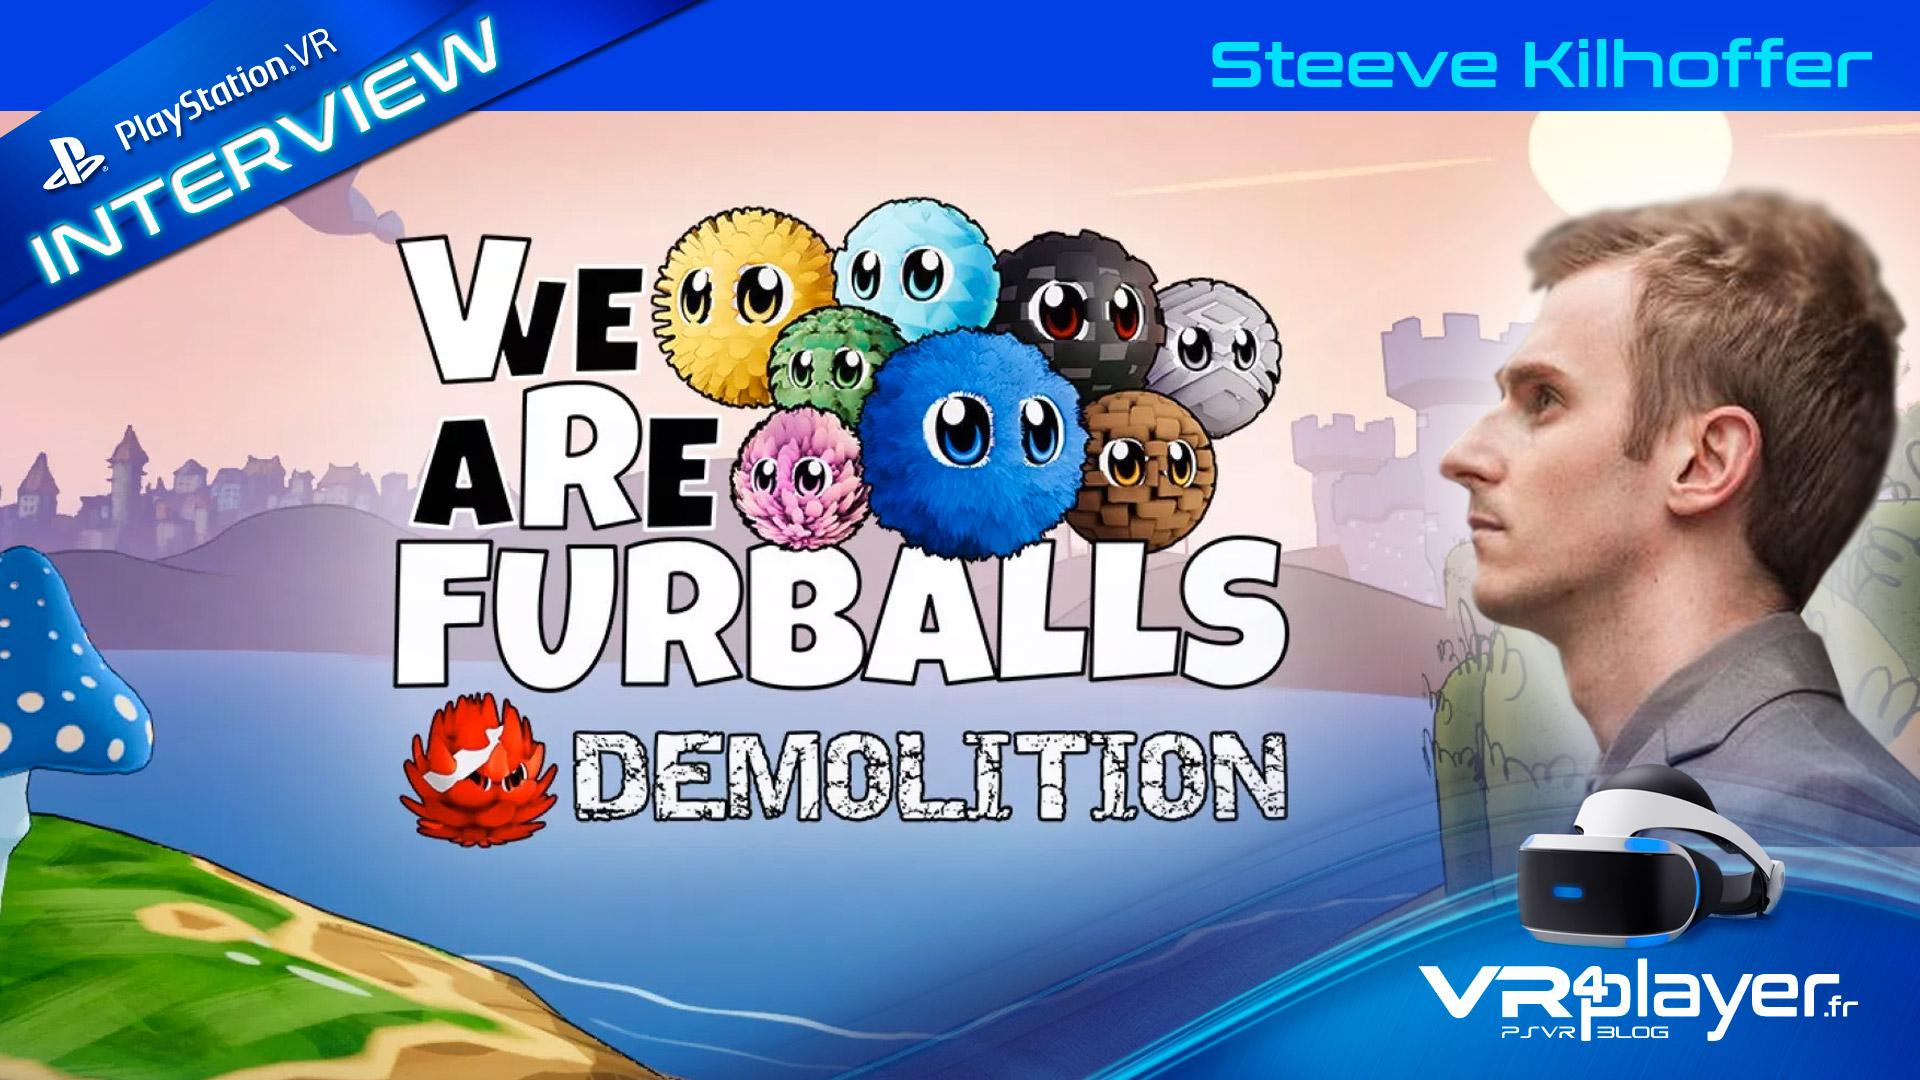 interview Steeve Kilhoffer VR4player VR Furballs